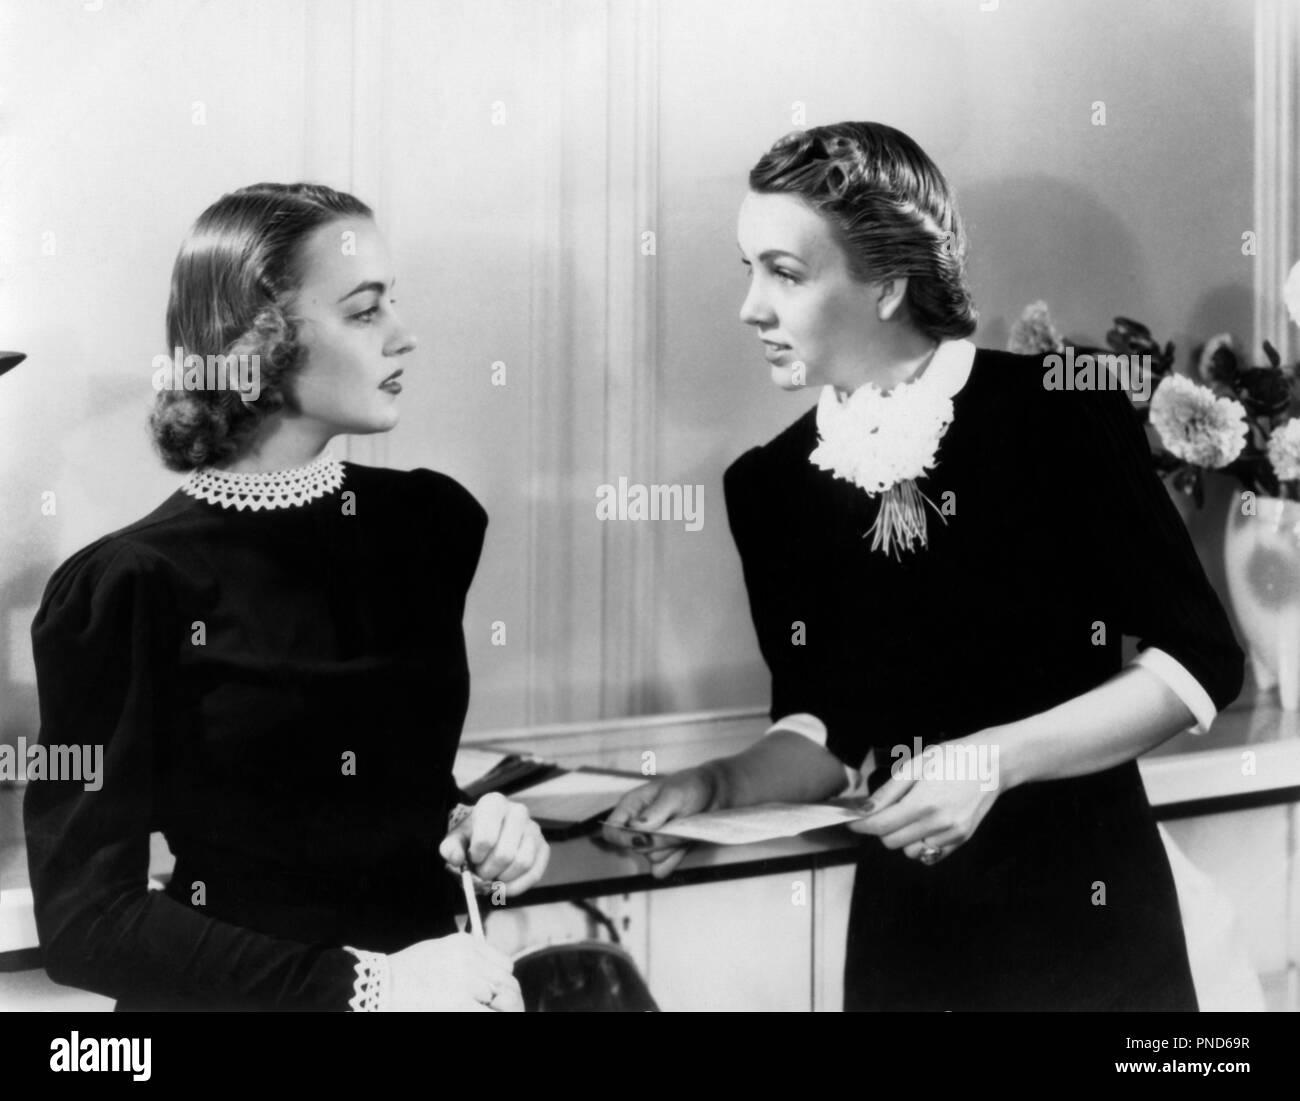 1940s Fashion Women Stock Photos & 1940s Fashion Women ...